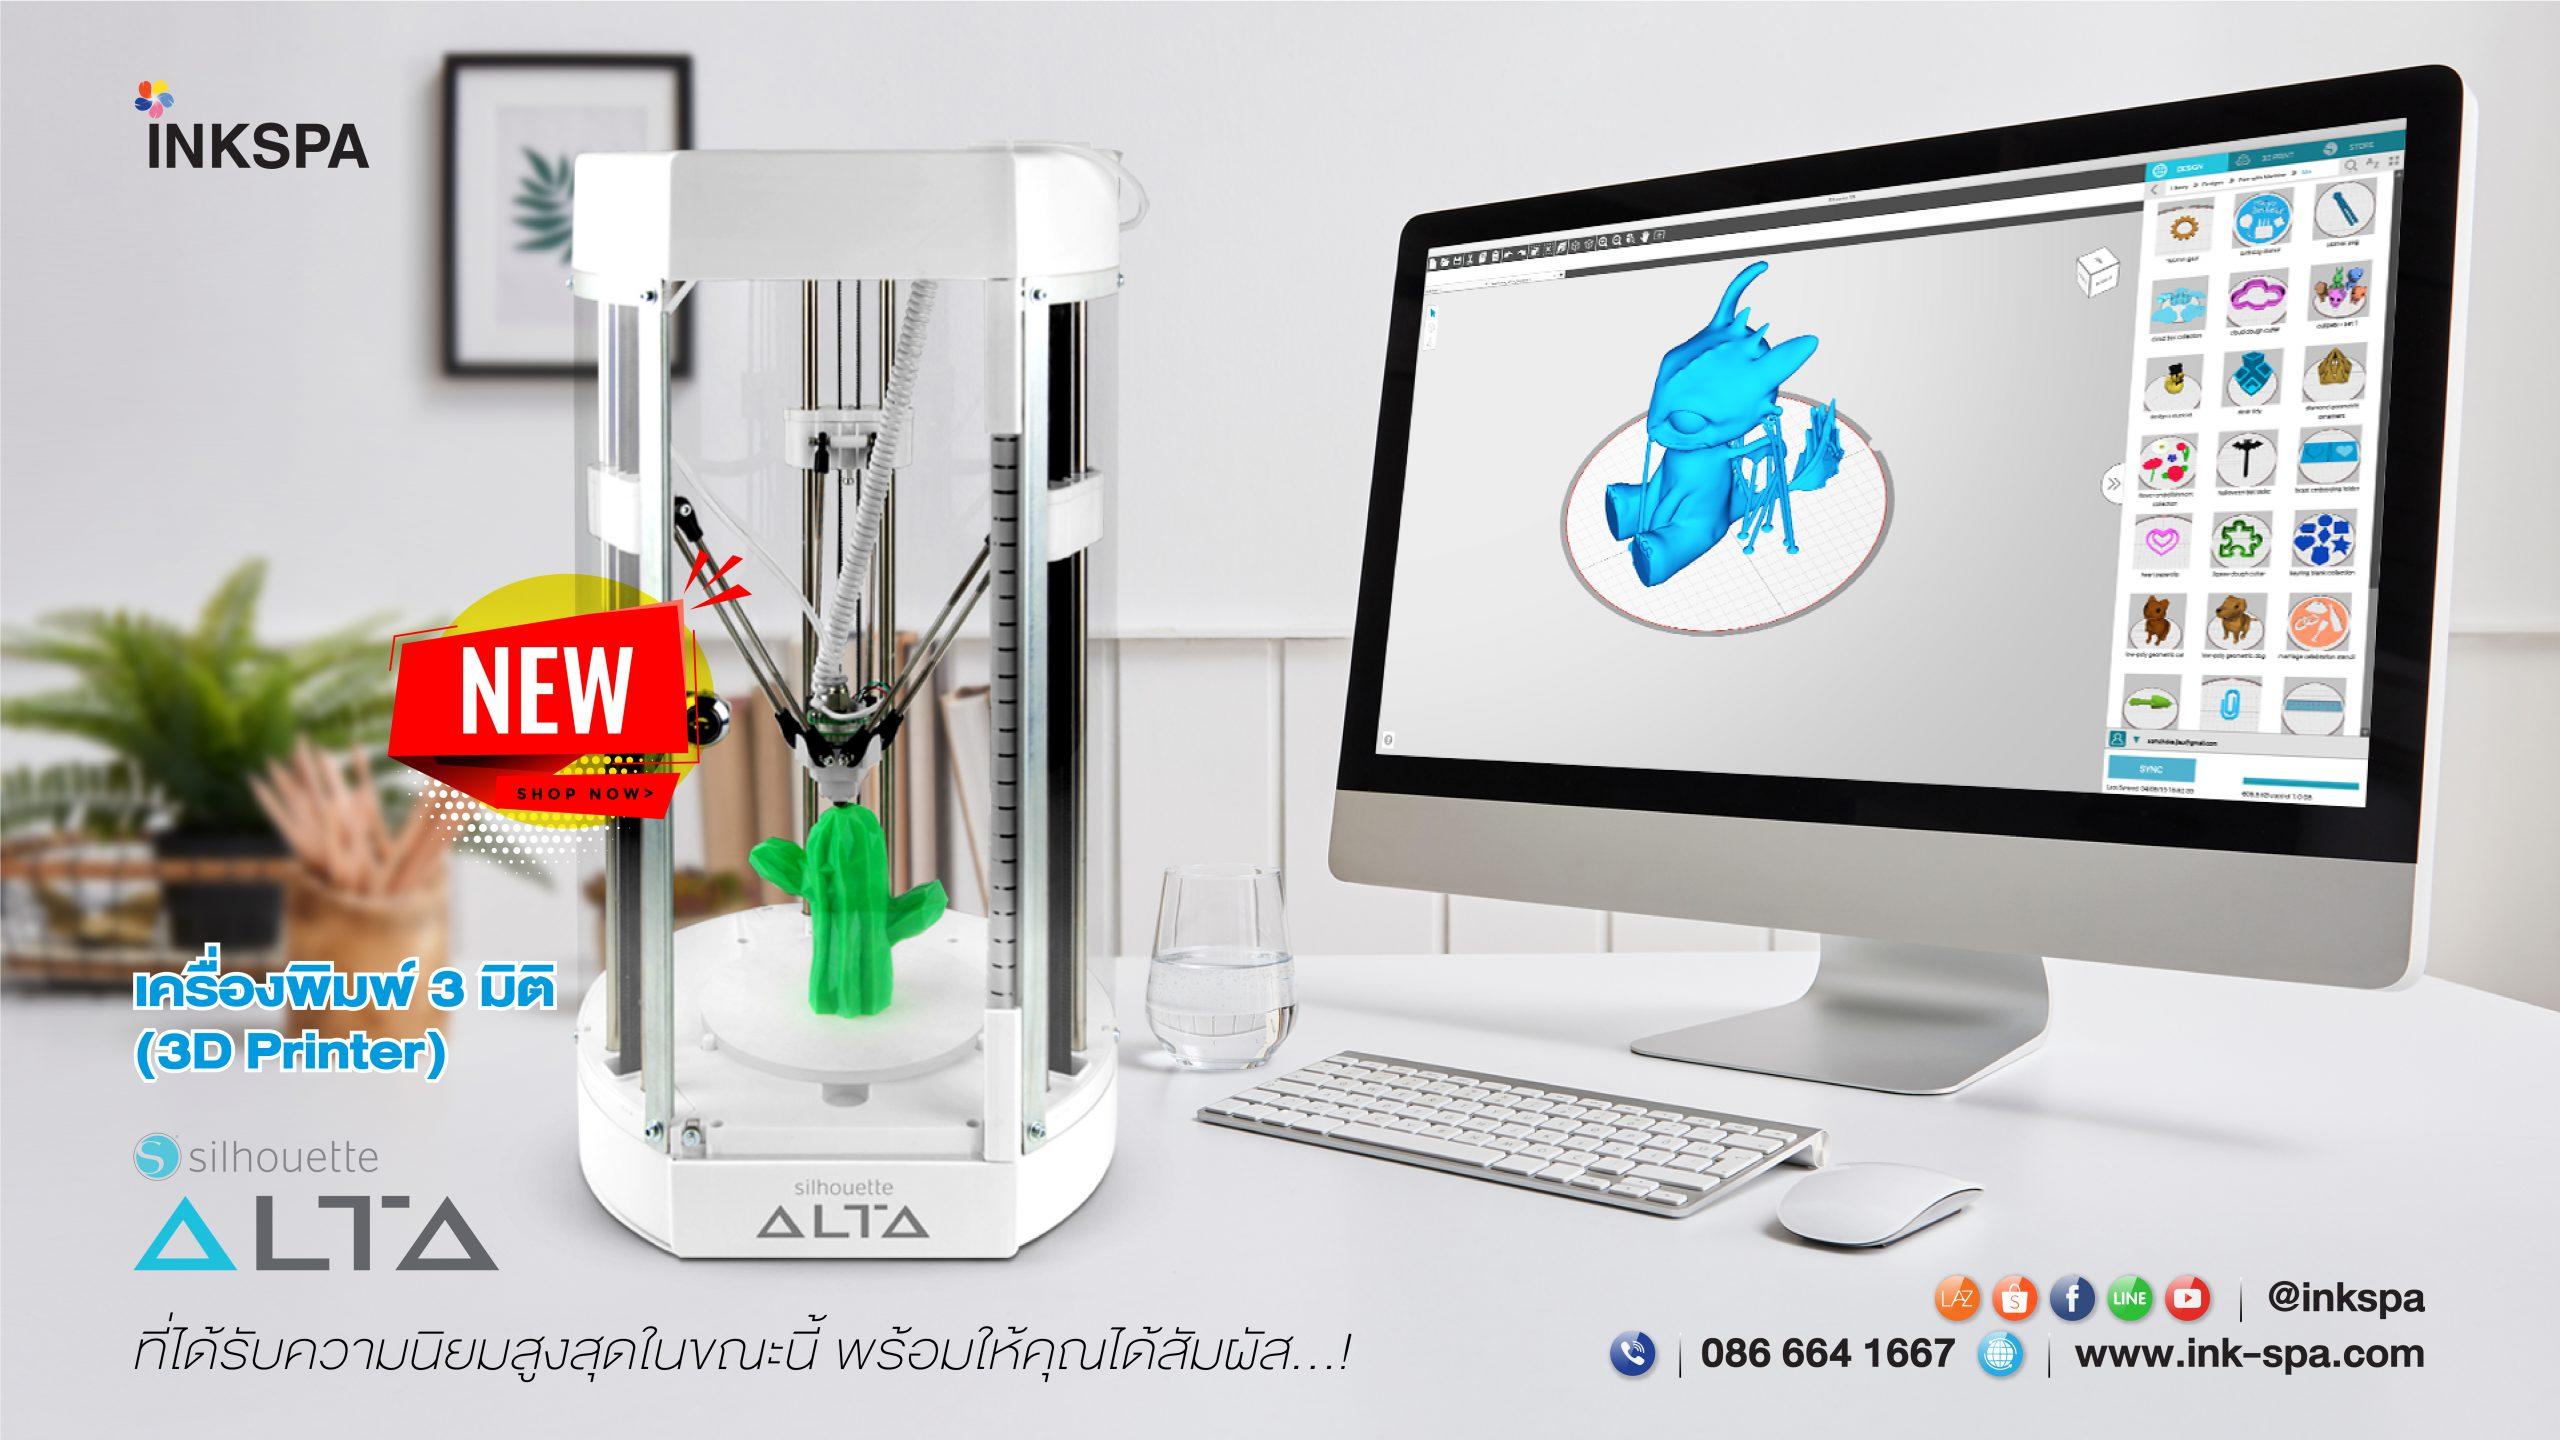 Silhouette Alta, เครื่องพิมพ์ 3D, เครื่องพิมพ์สามมิติ, แผ่นรองชิ้นงาน ALTA, ALTA PLATFORM TAPE